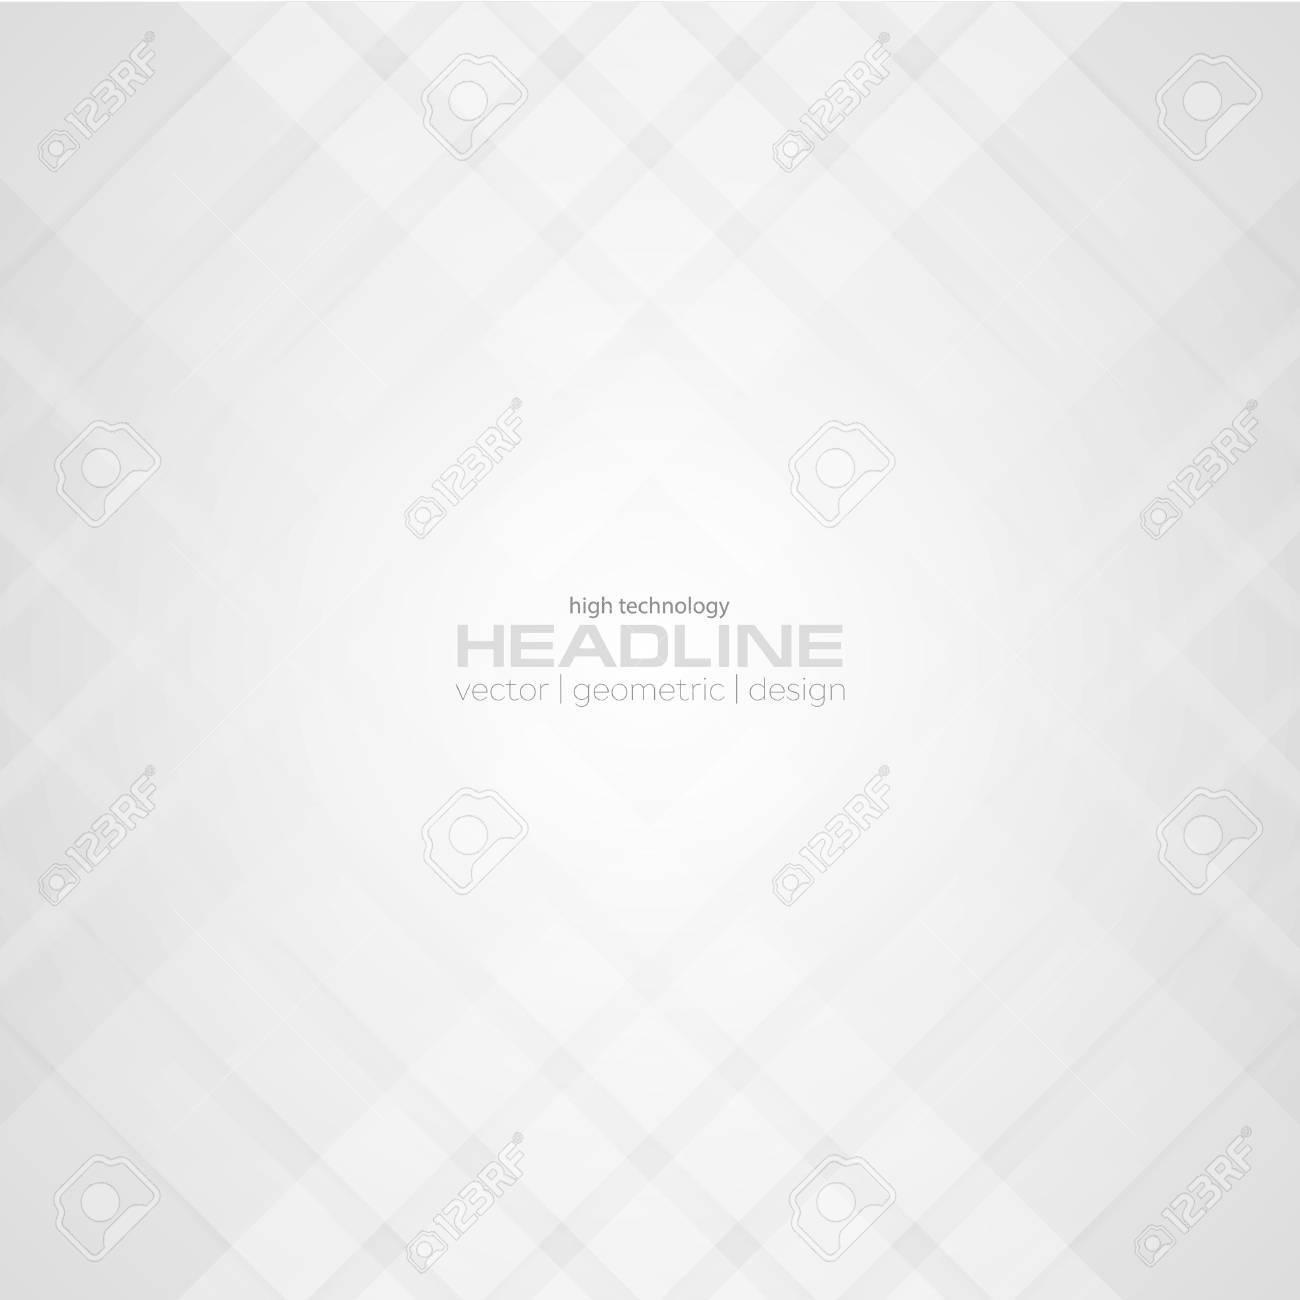 Abstract light grey tech pattern background. Vector geometric design - 71454008